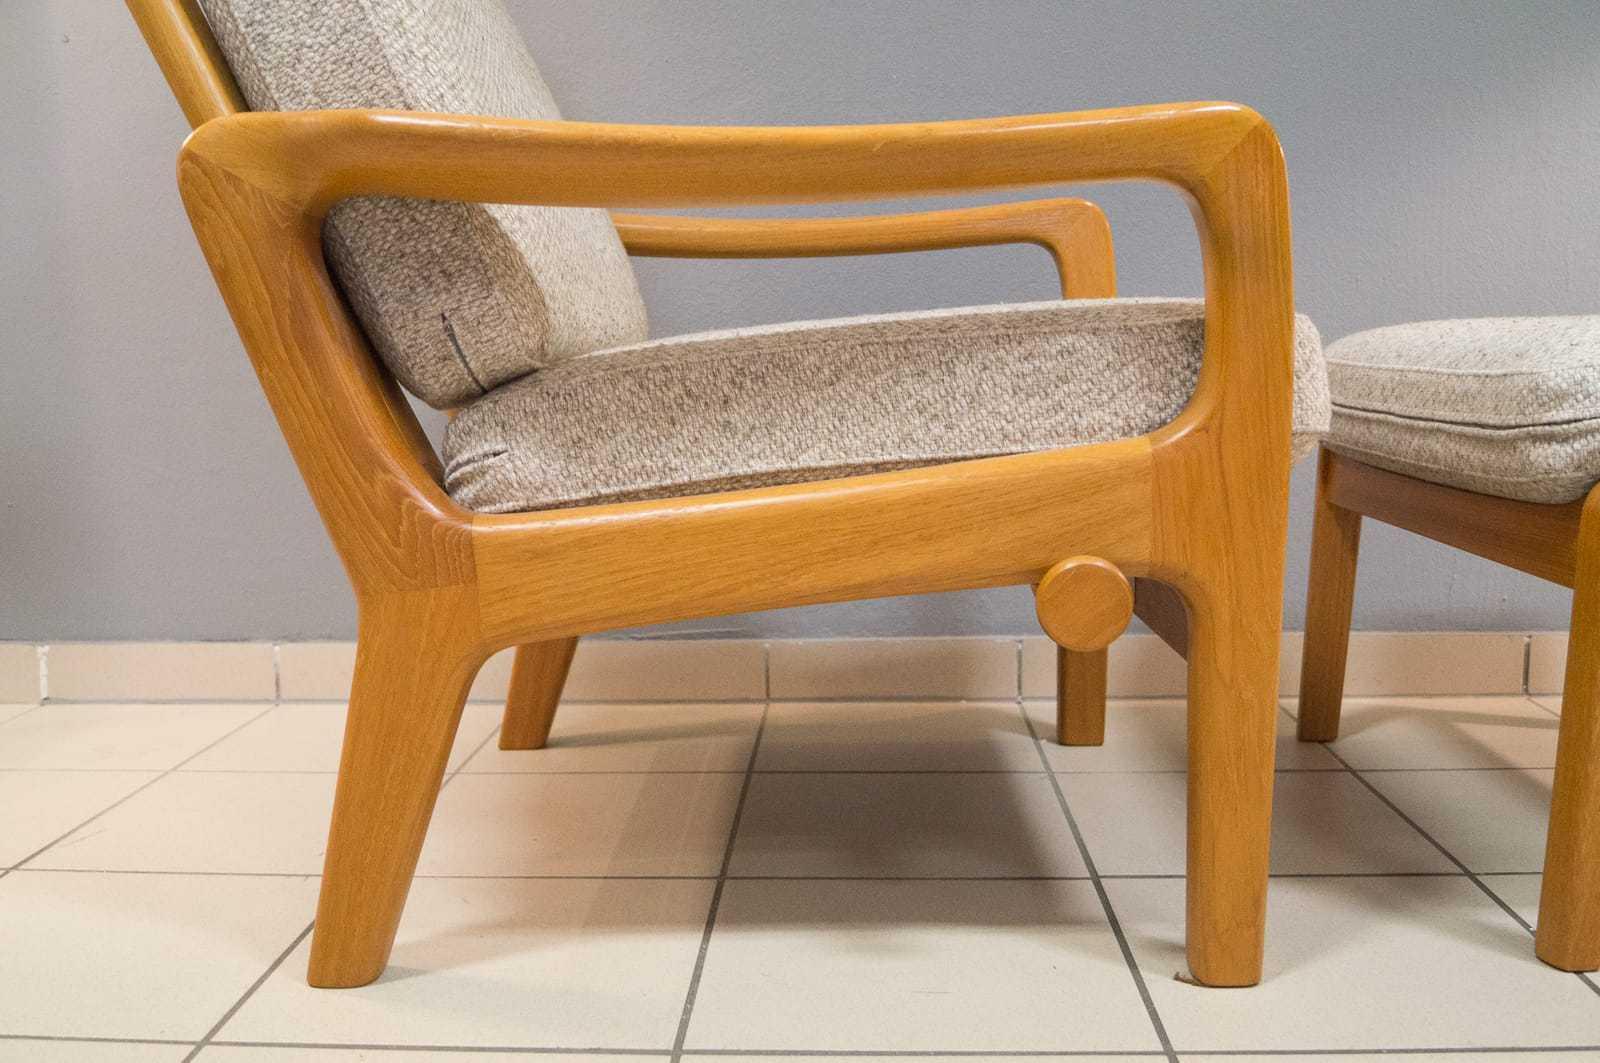 verstellbarer juul kristensen hochlehn sessel mit hocker hochlehner teak vintage ebay. Black Bedroom Furniture Sets. Home Design Ideas